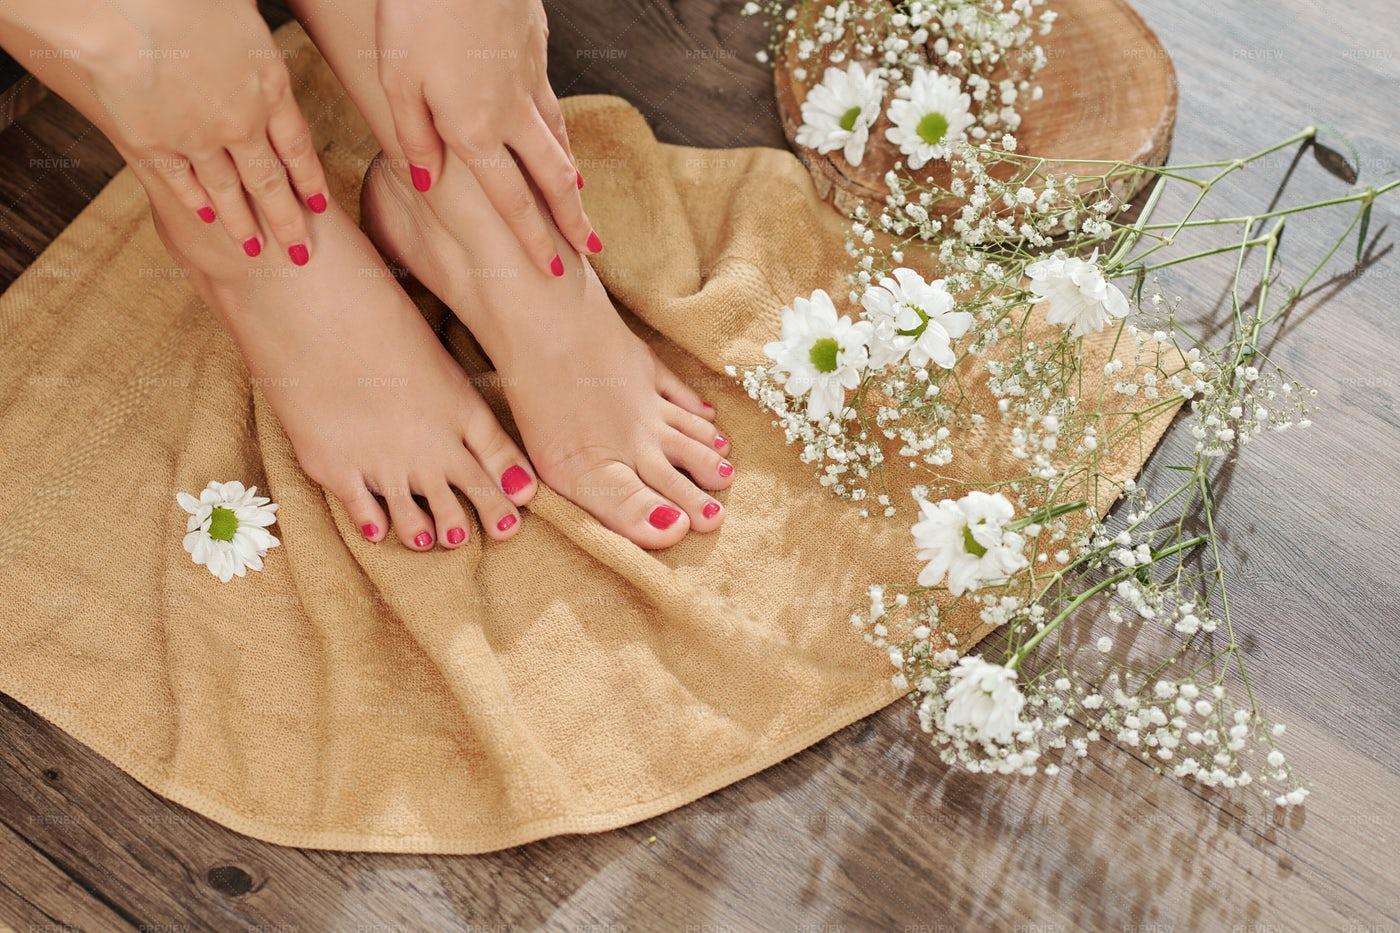 Woman Wiping Pedicured Feet: Stock Photos